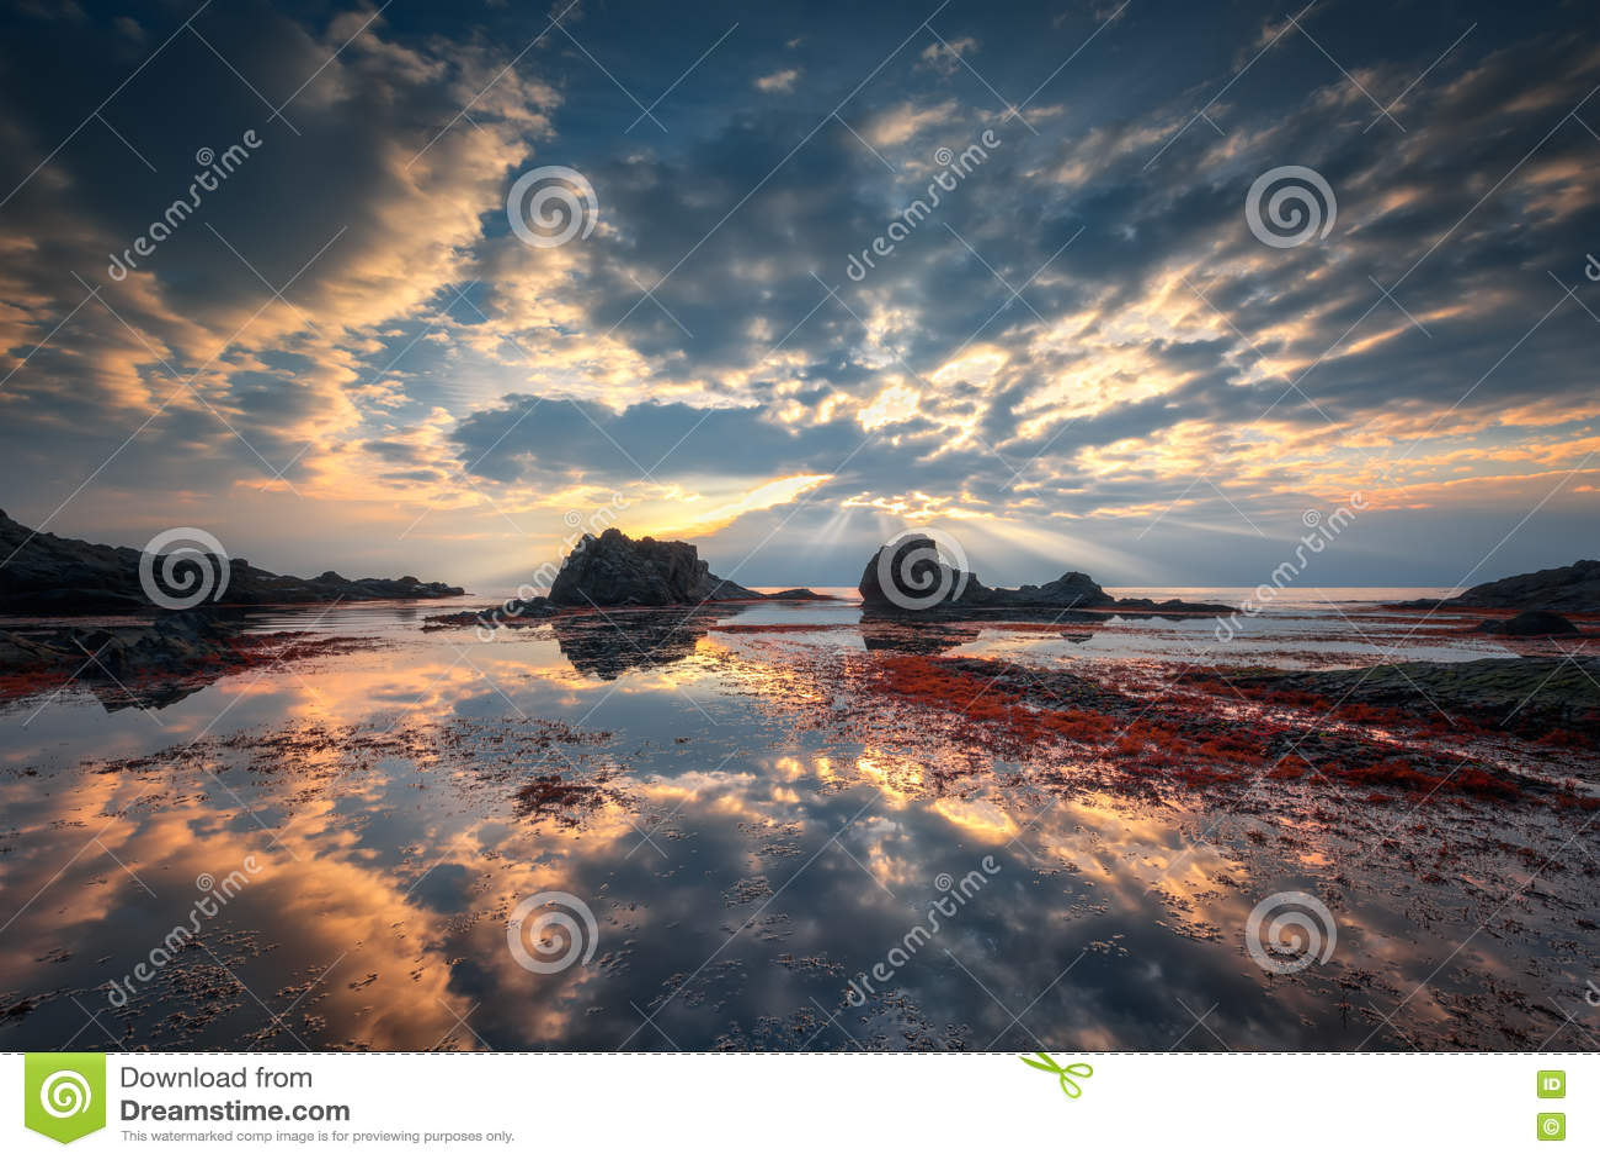 Tre te восхода солнца c d Франции Нормандии пляжа alb утесистое